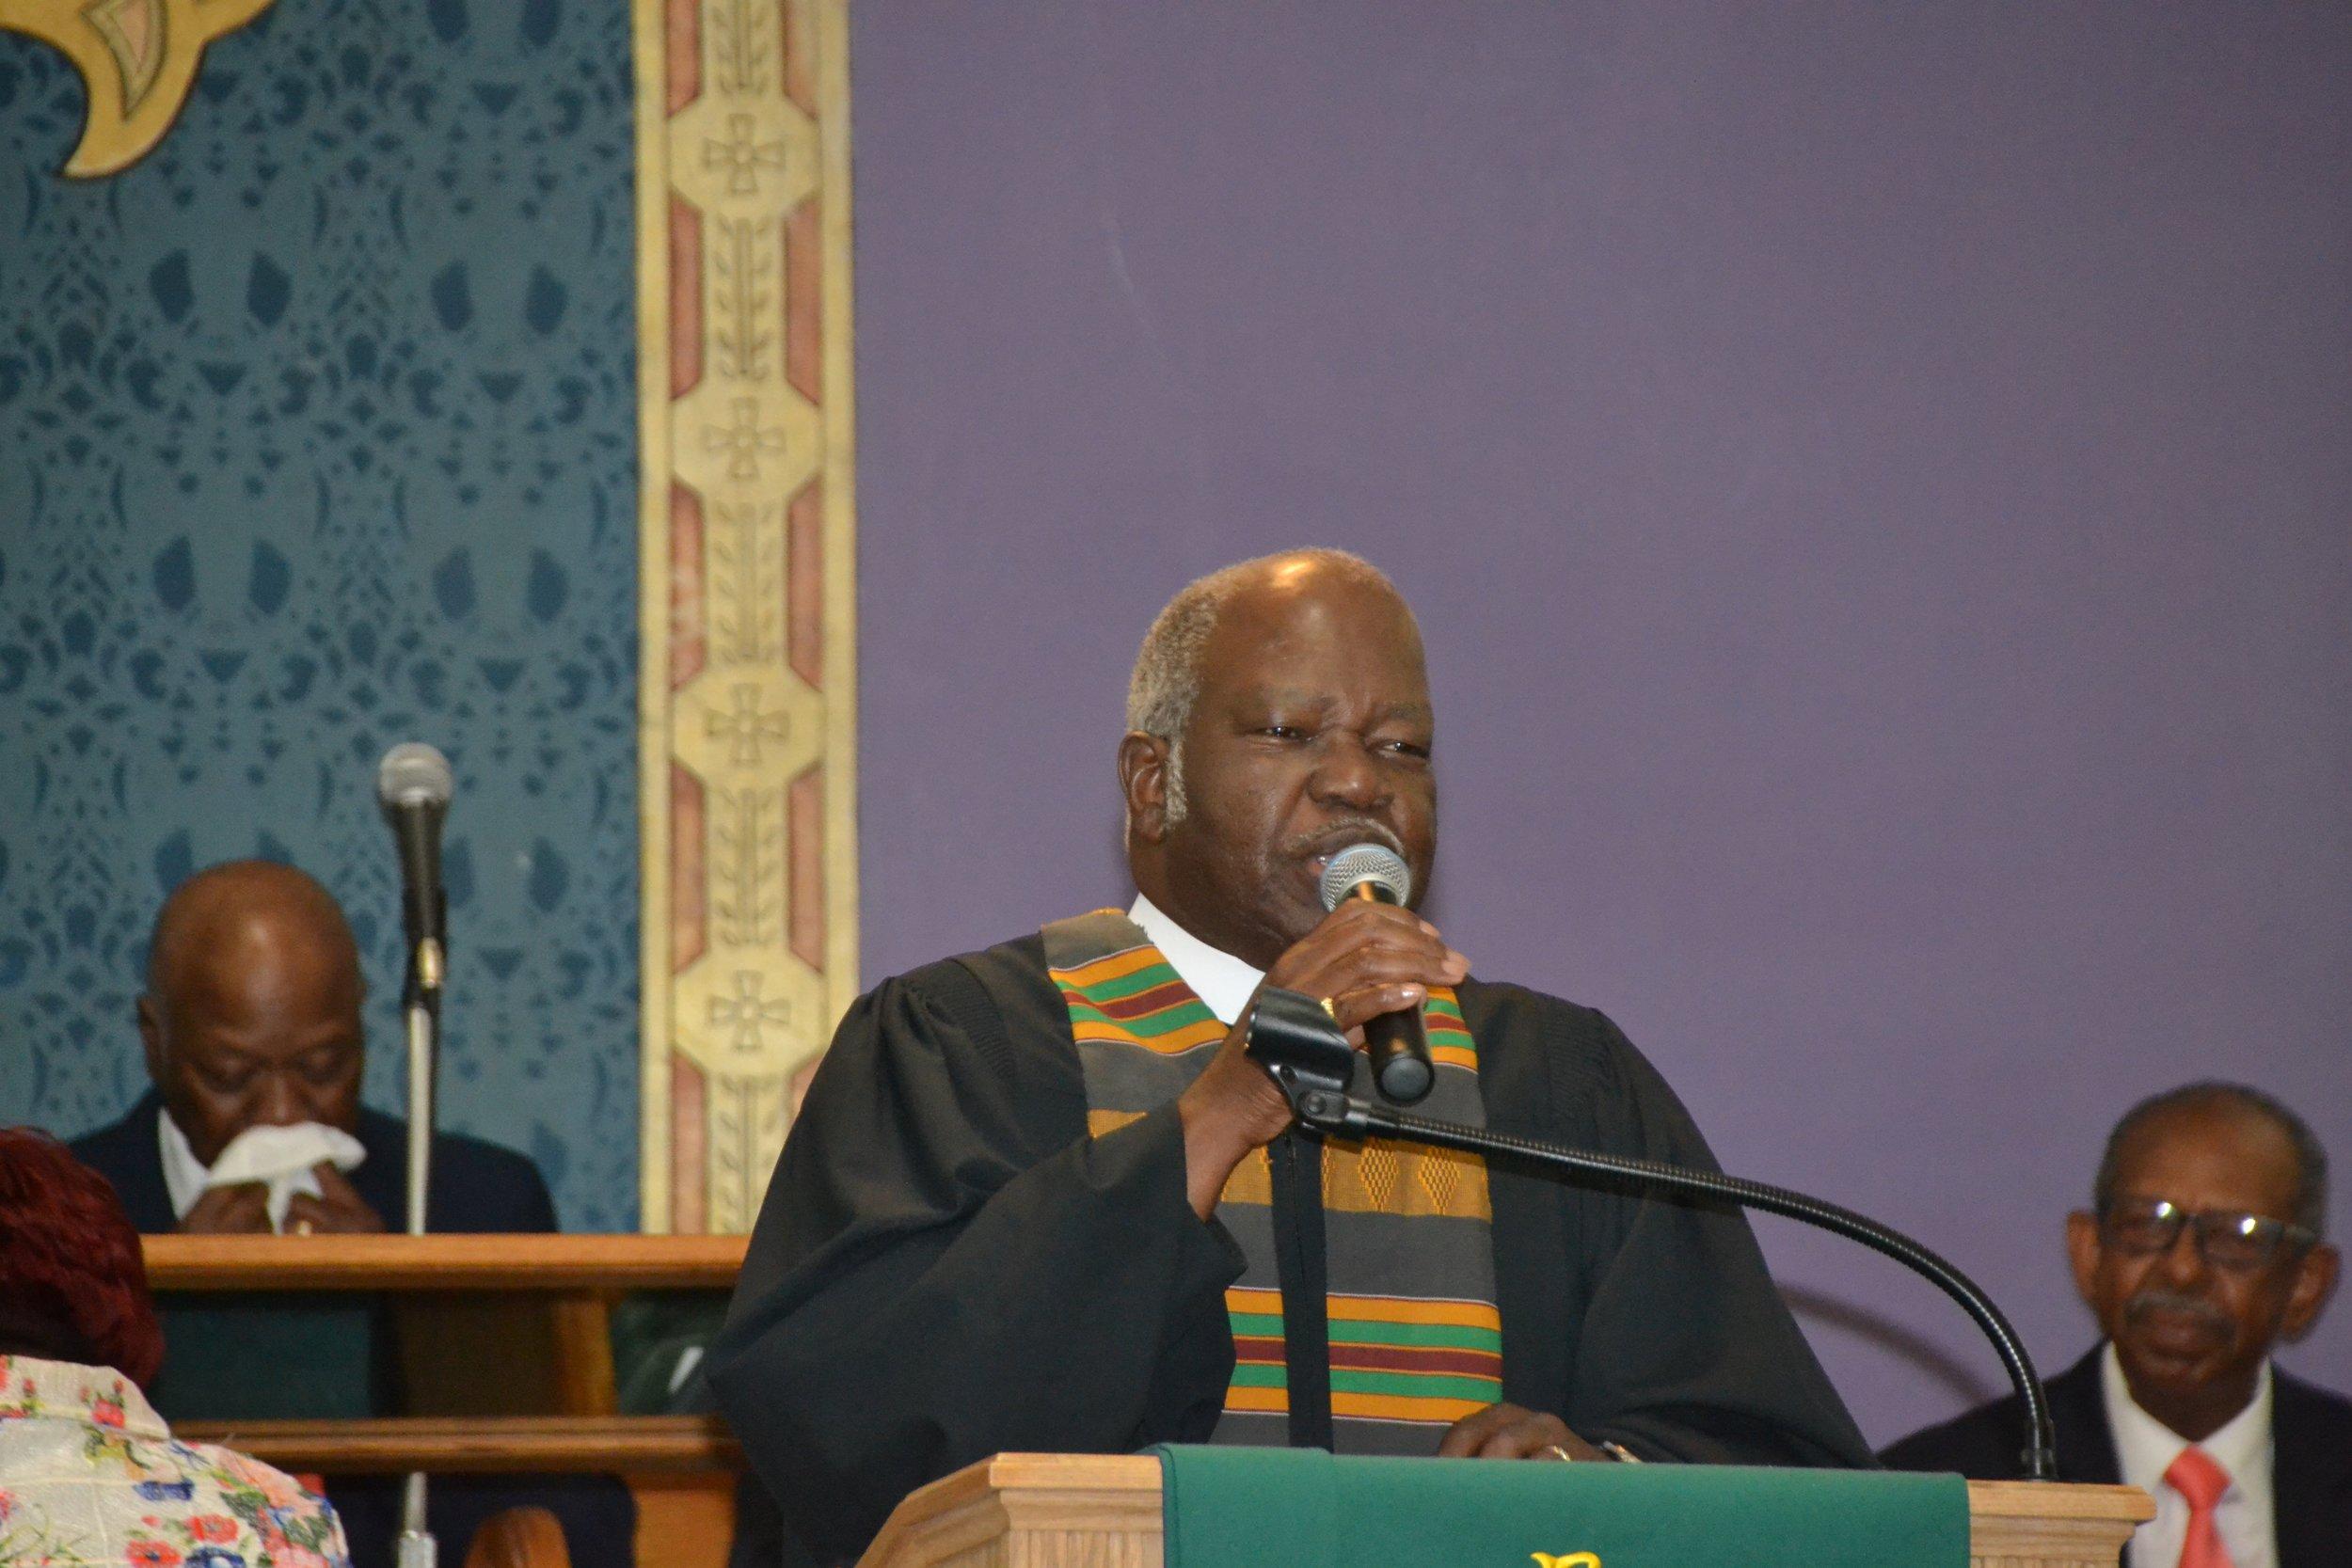 Rev. Howard grant - Rev. Howard Grant is a retired Presiding Elder. He served as a Pastor/Presiding Elder for over 40 years, and currently serves as an associate minister at Mt. Pisgah.